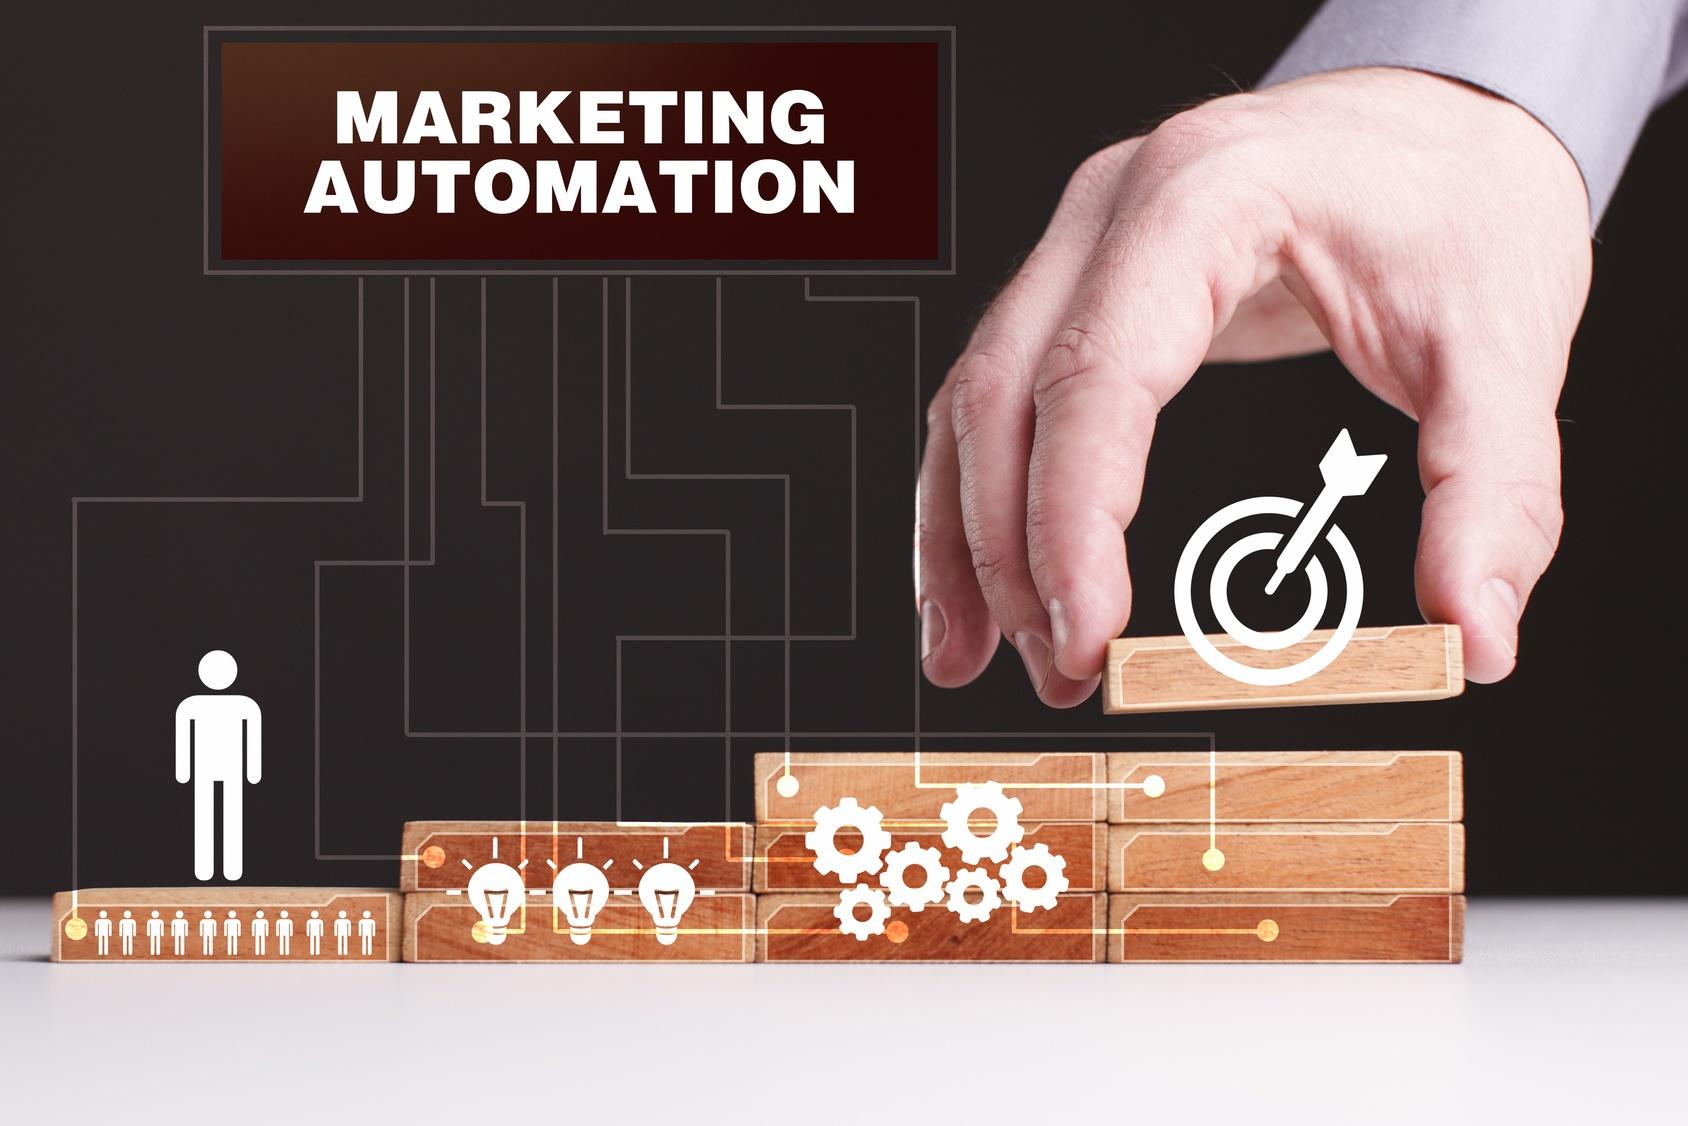 b2b marketing automation.jpg